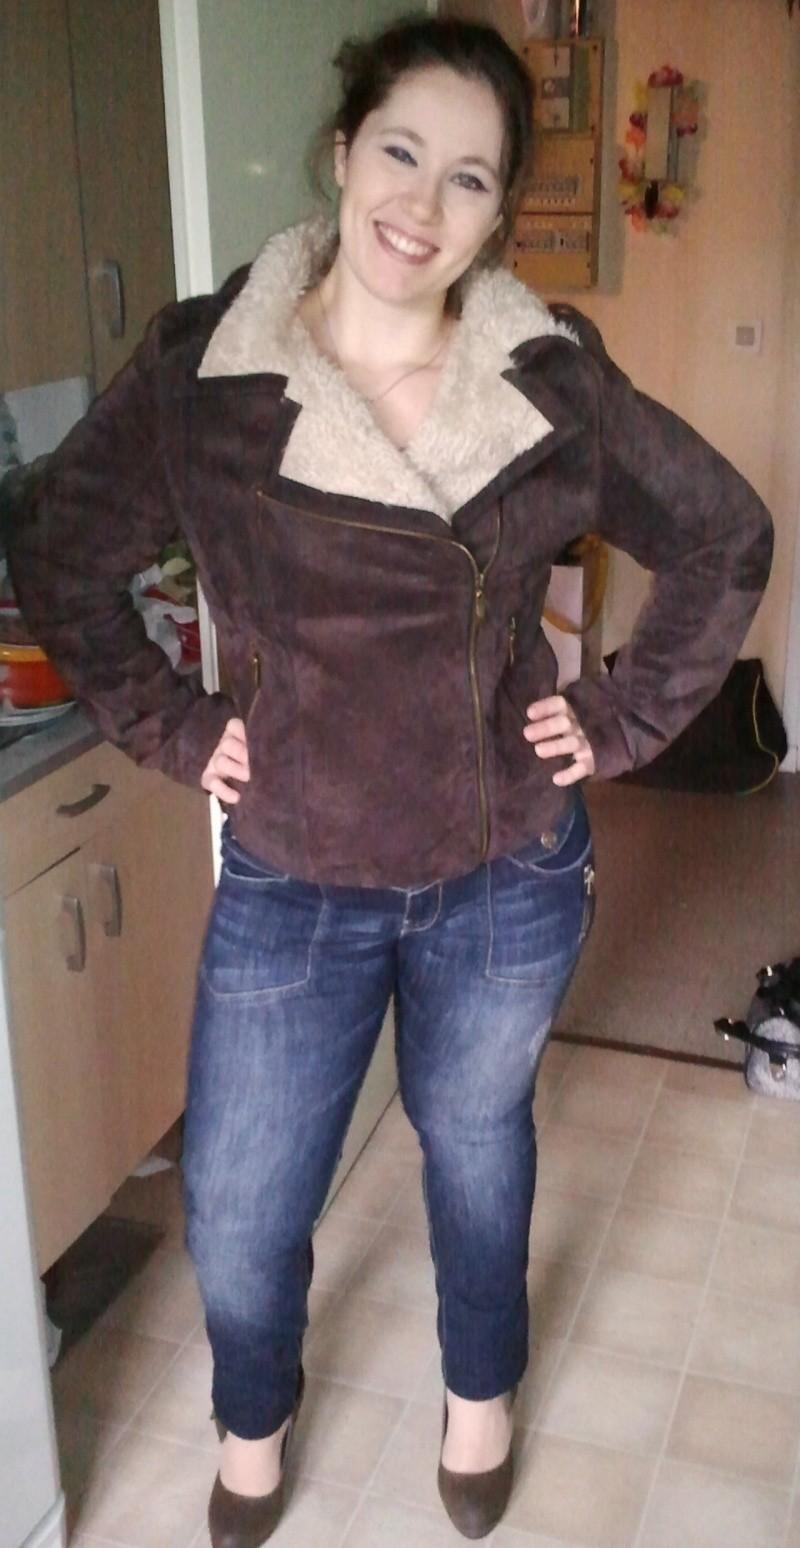 moi - 44.1, kilos sleeve le 14 avril 2011 - Page 4 Photo214